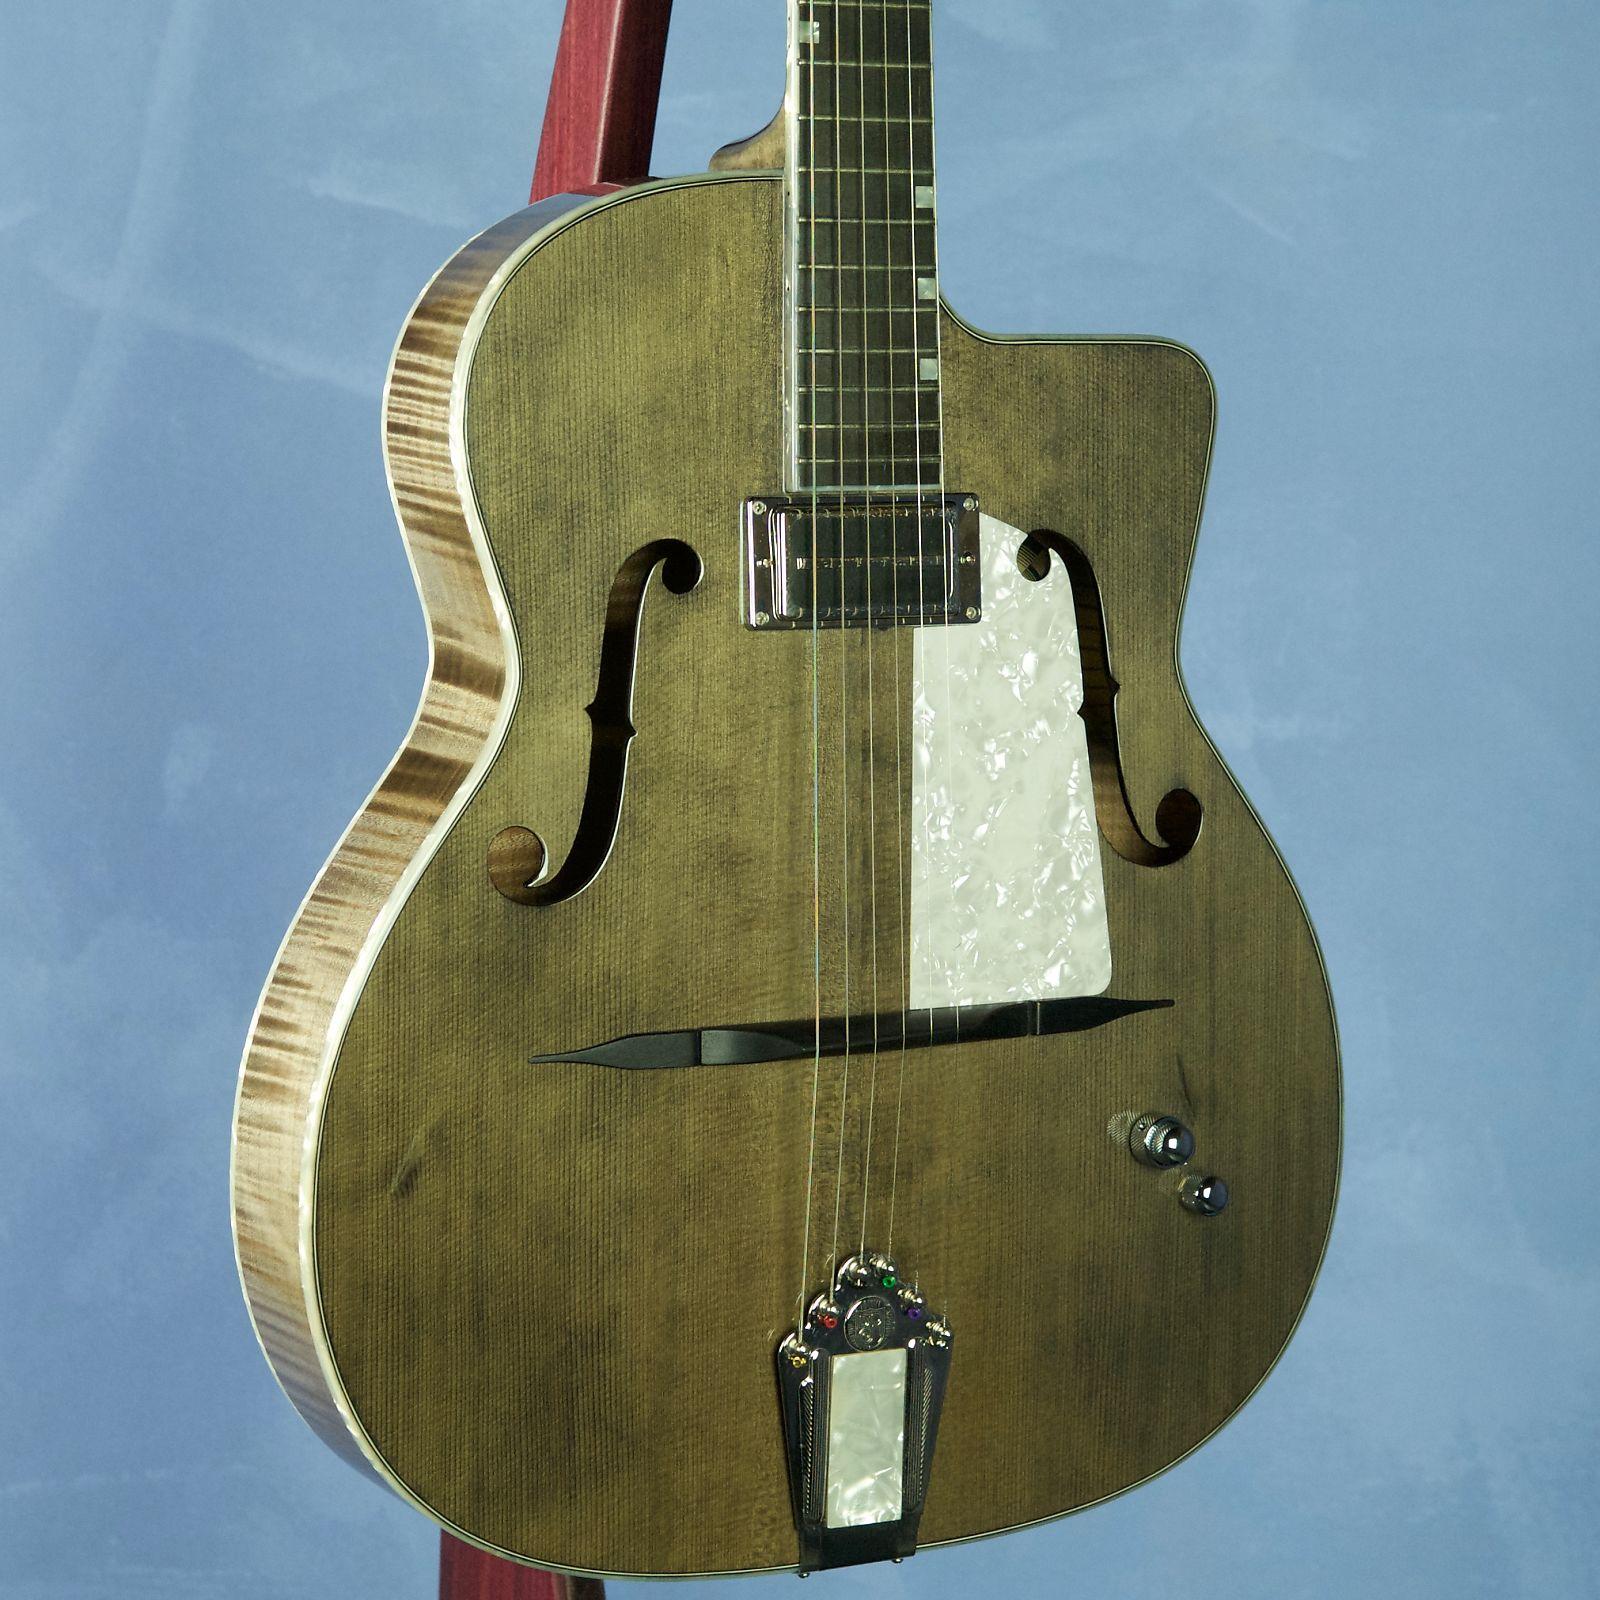 Shelley D. Park F-Hole Hybrid Ghost Guitar